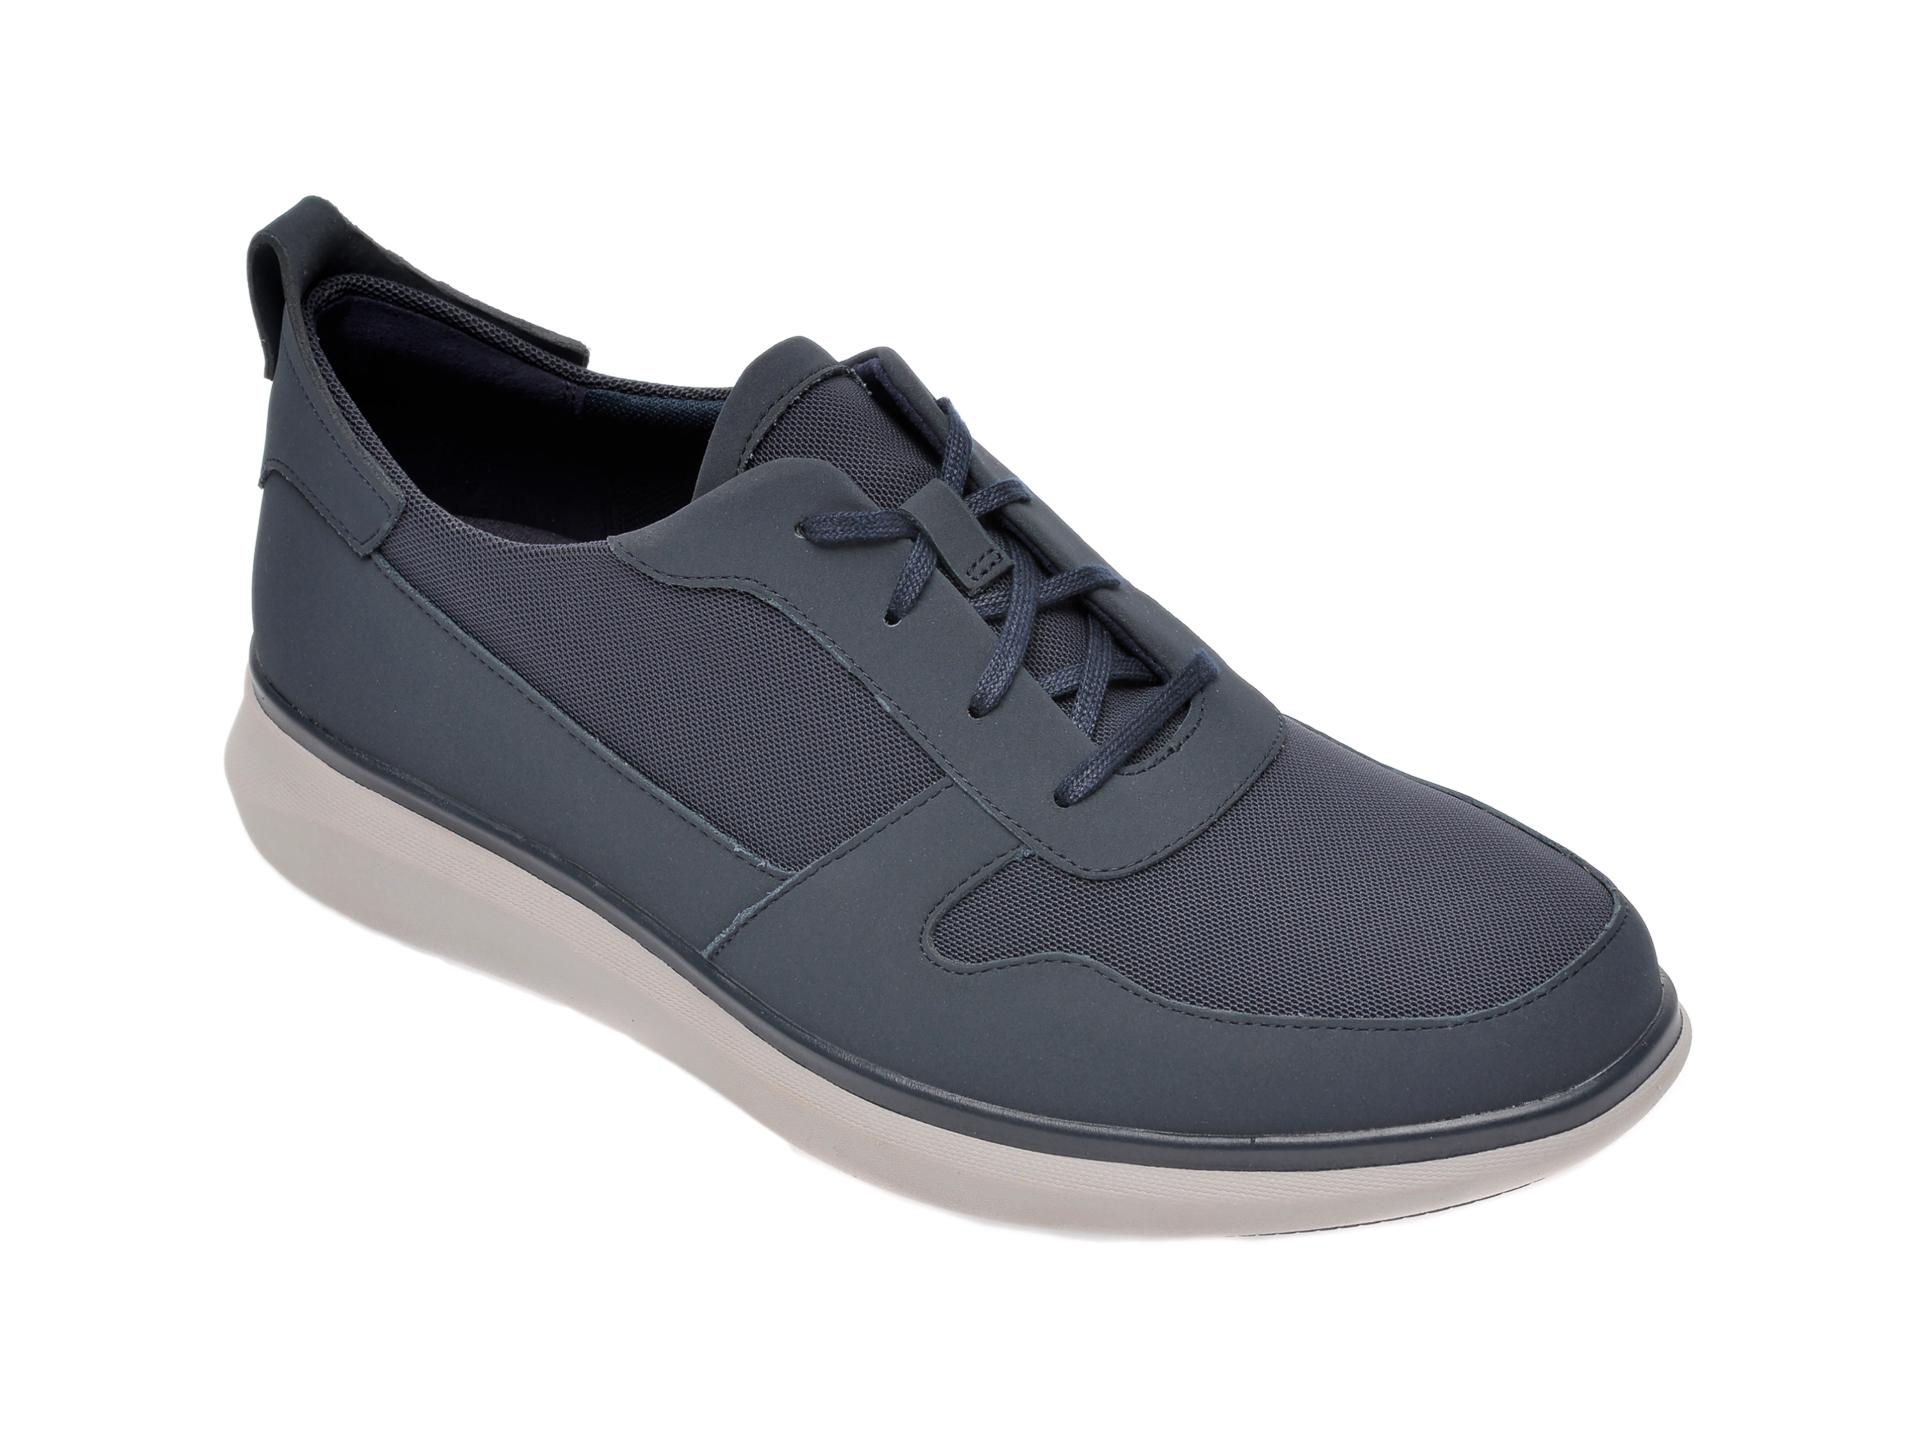 Pantofi Clarks Bleumarin, Un Globe Sport, Din Nabuc Si Material Textil